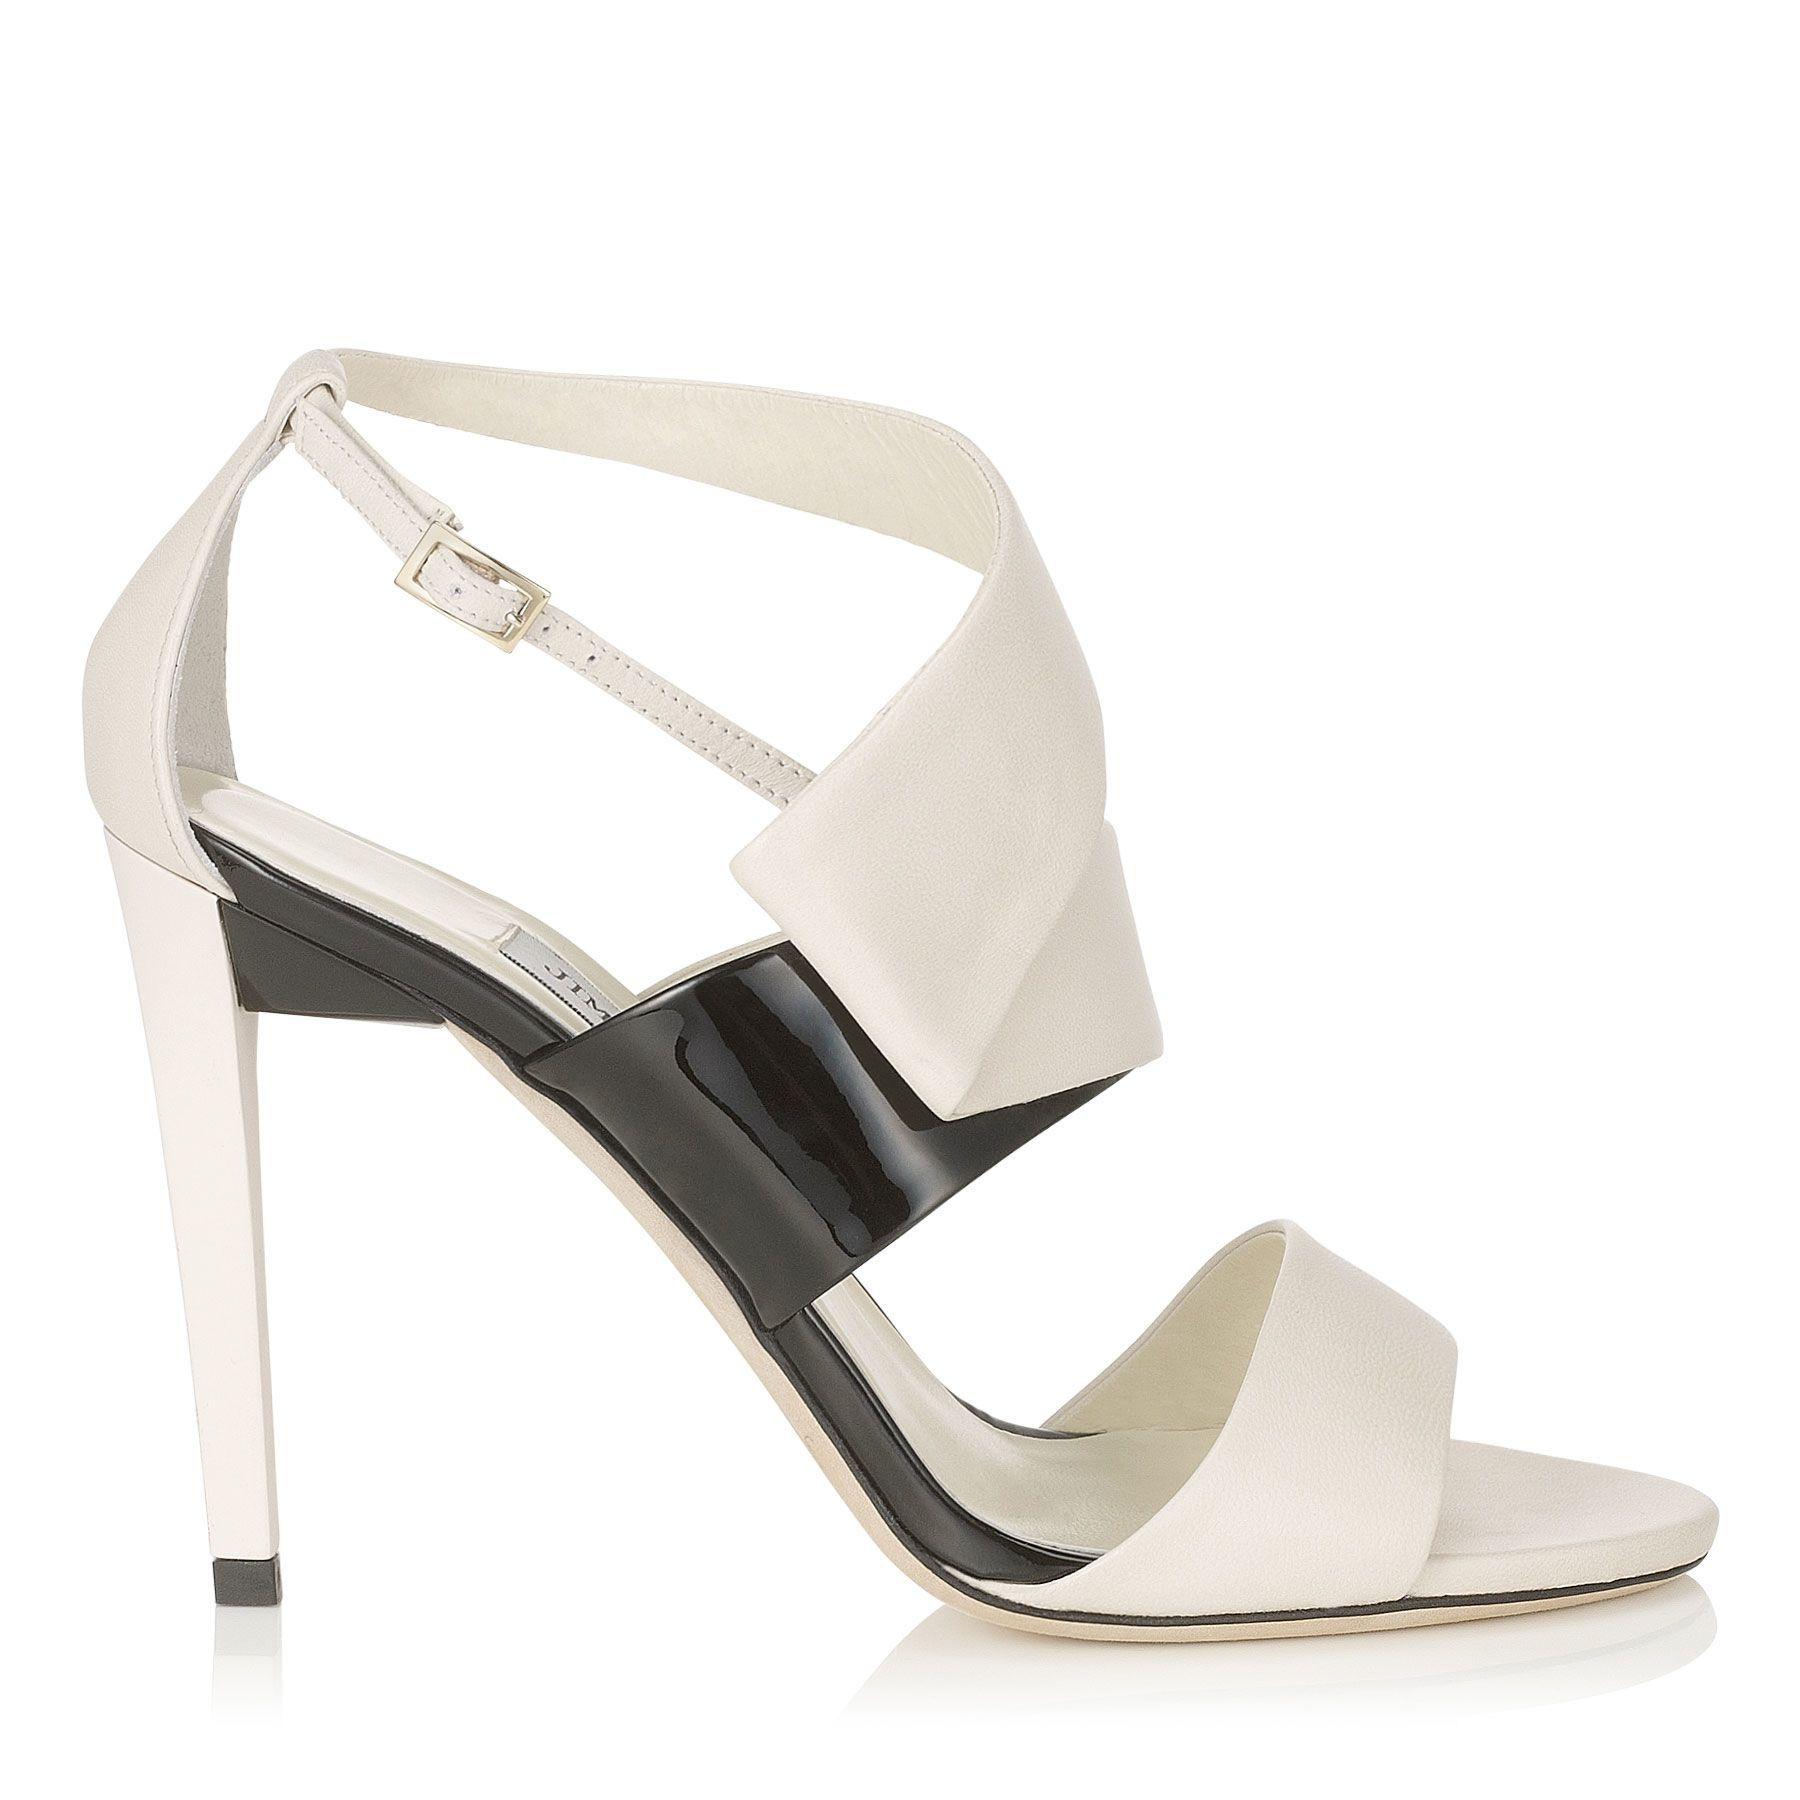 Jimmy Choo Trapeze 100 Nappa Patent Leather Women Sandals Off White/ black